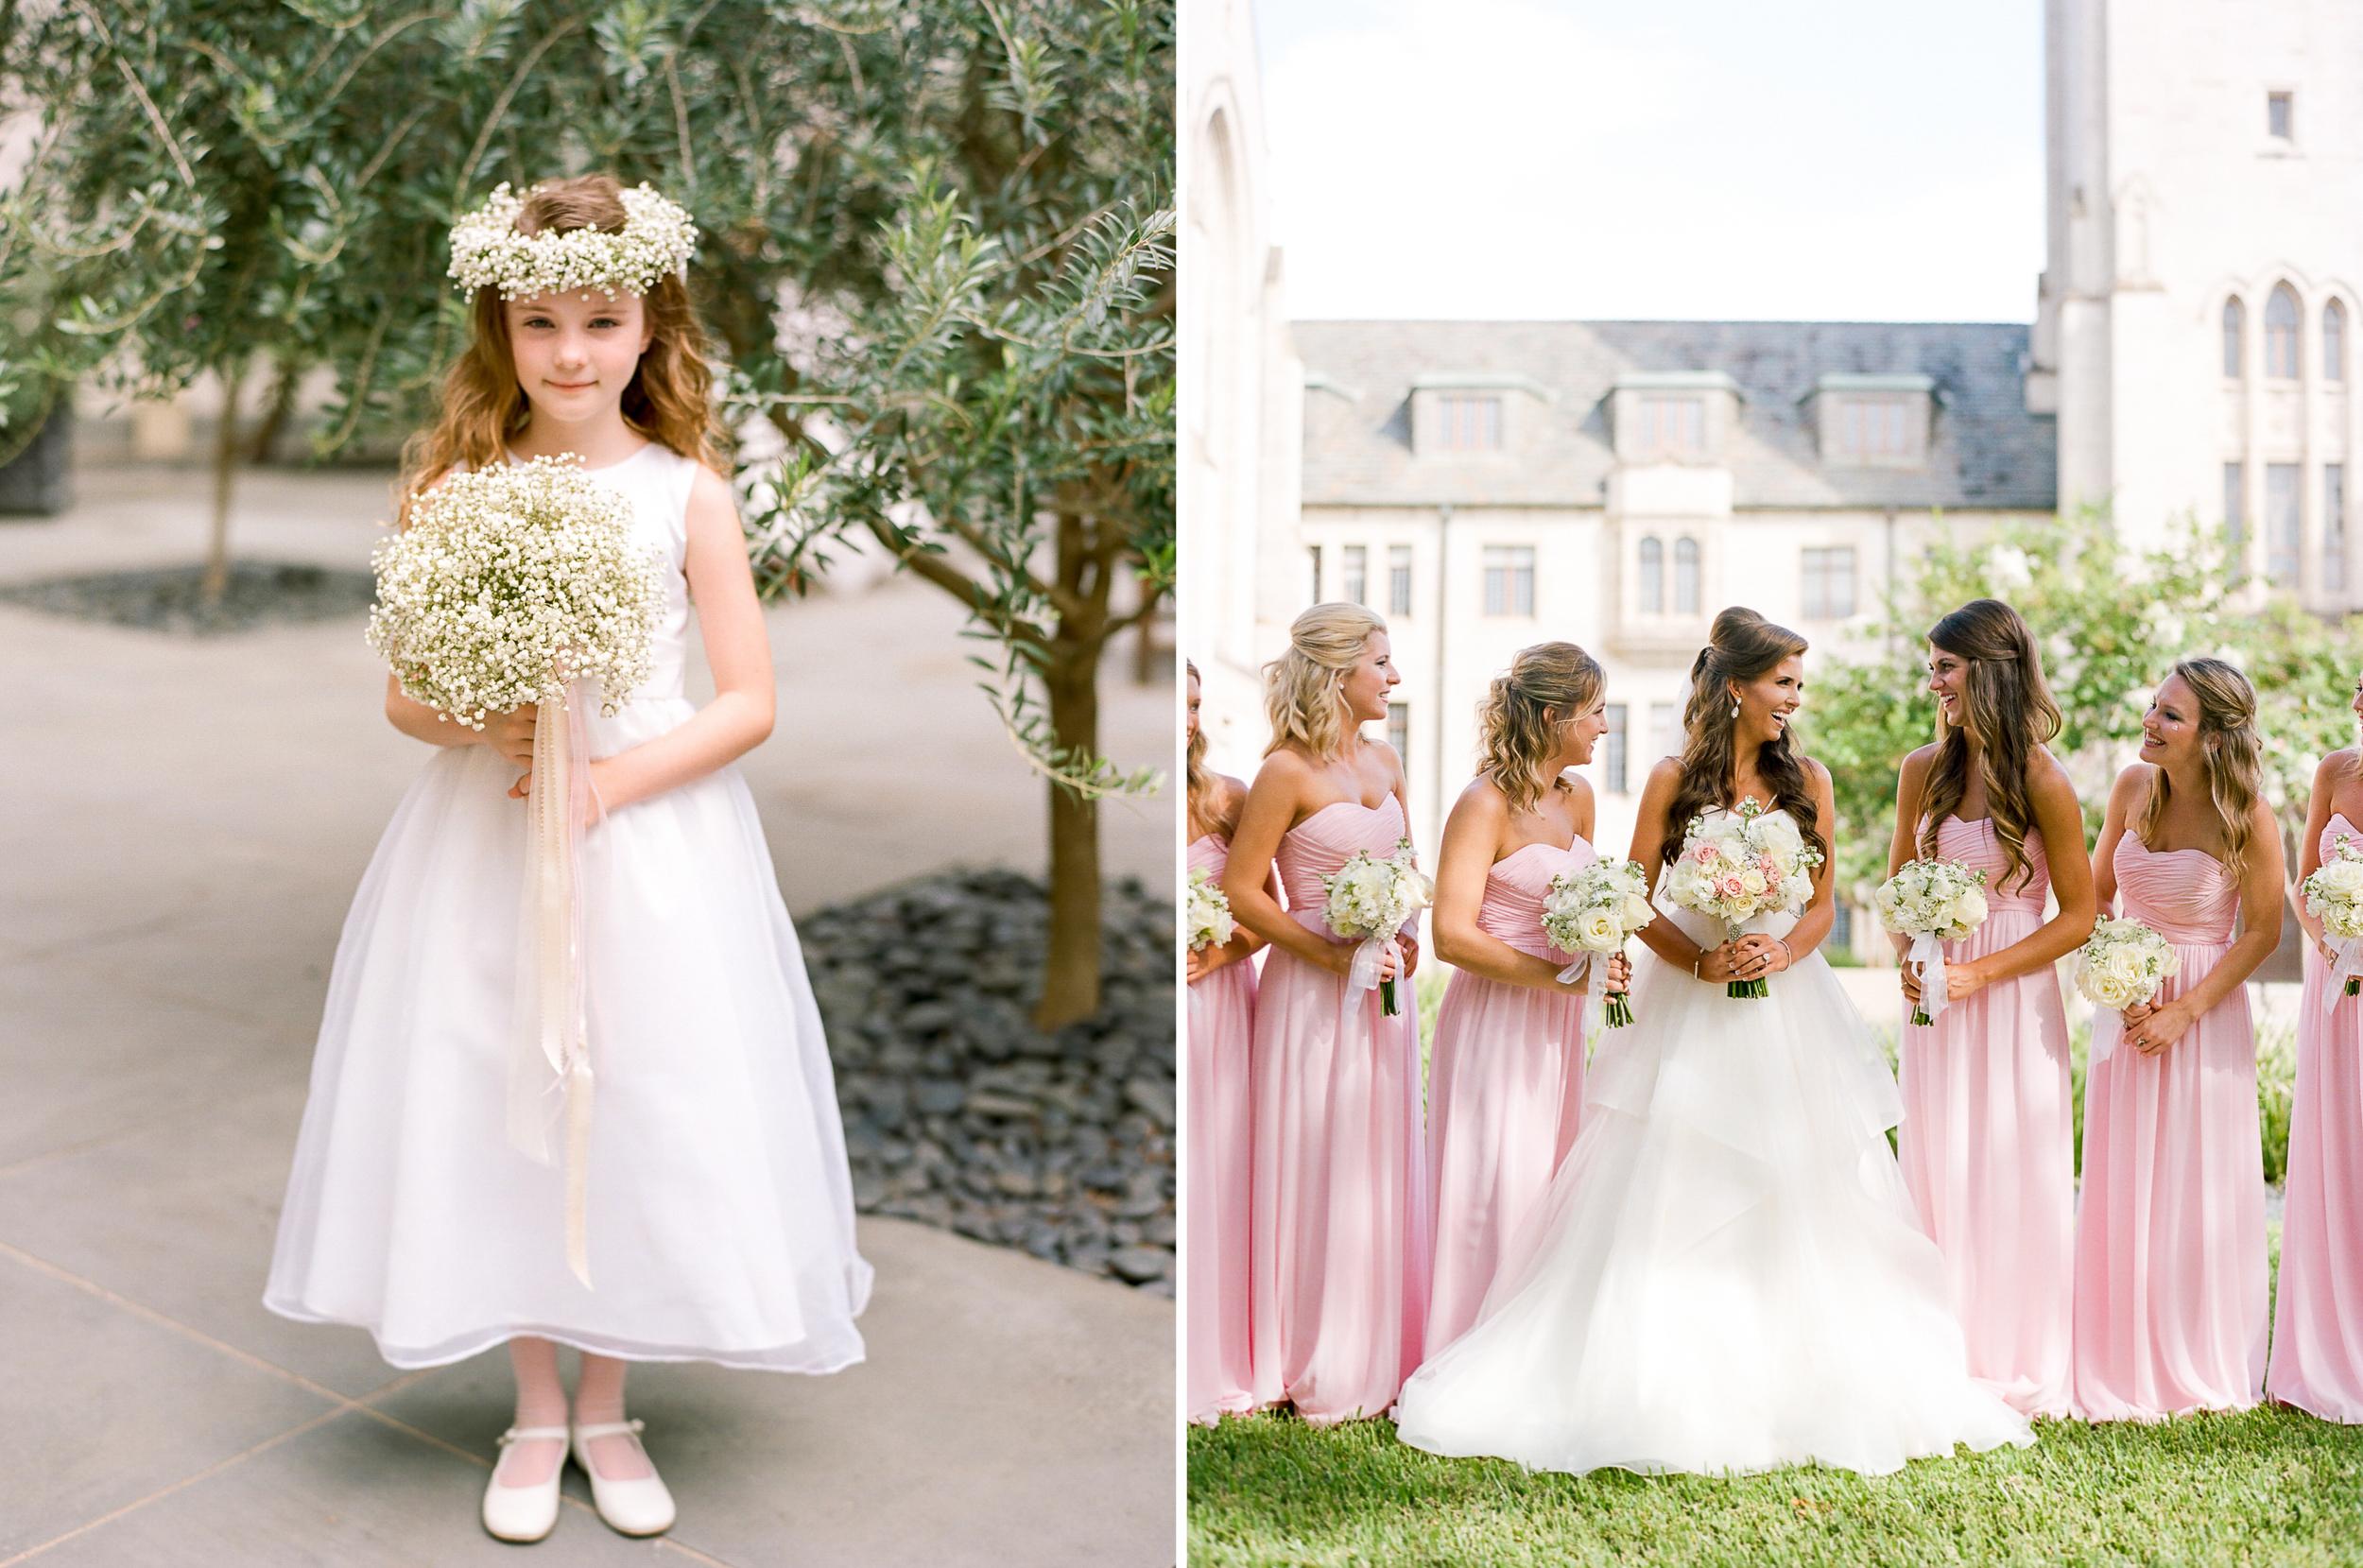 Dana-Fernandez-Photography-Weddings-in-Houston-Magazine-feature-Houston-wedding-photographer-film-131.jpg